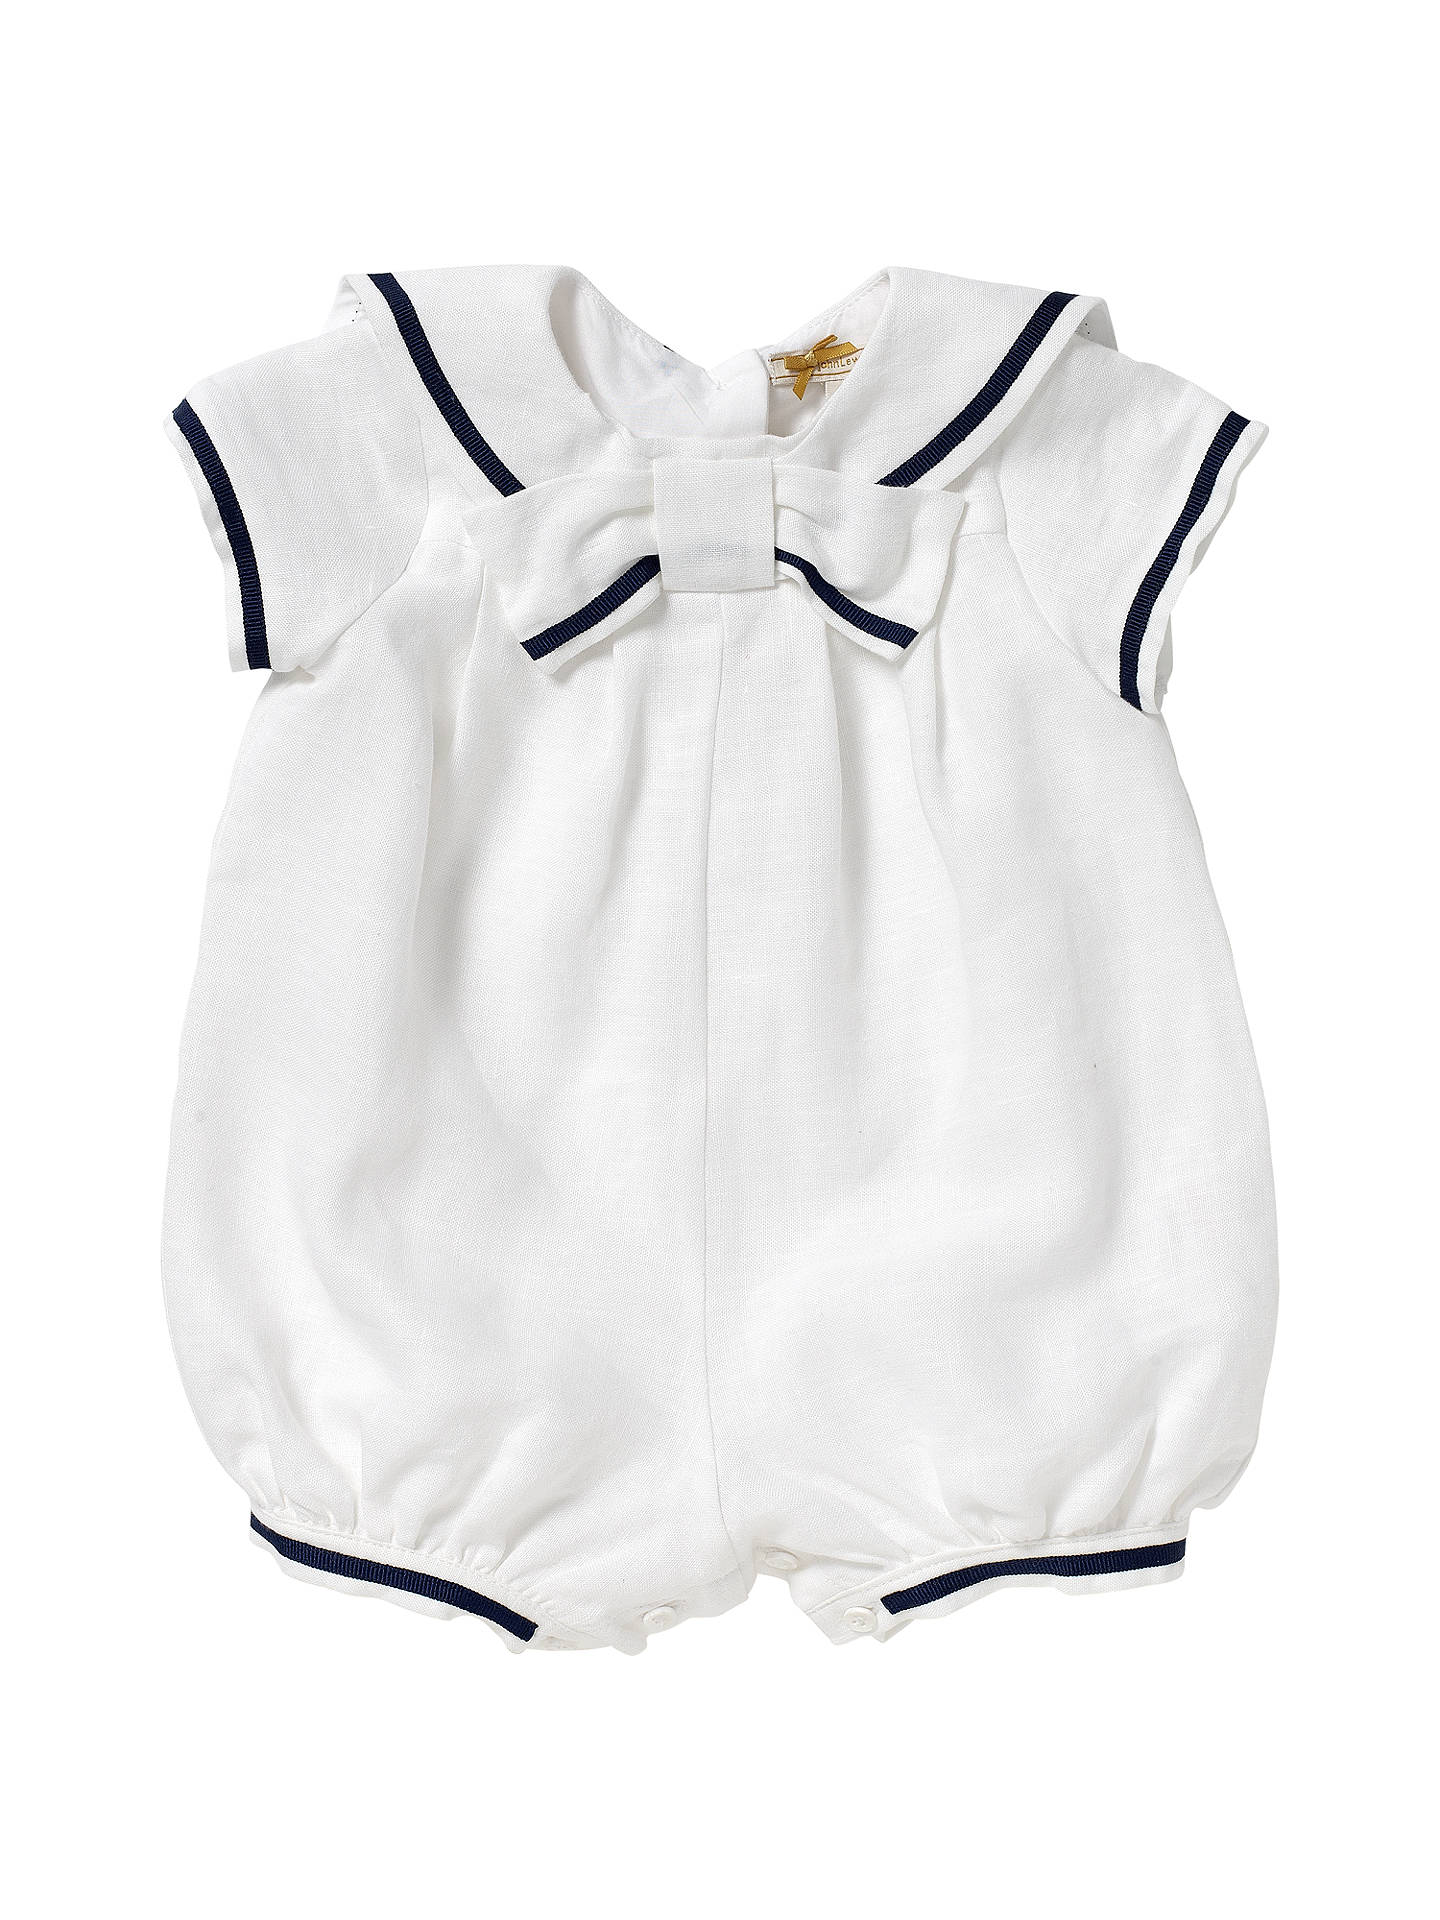 347991bfc17 Buy John Lewis Baby Linen Sailor Christening Romper